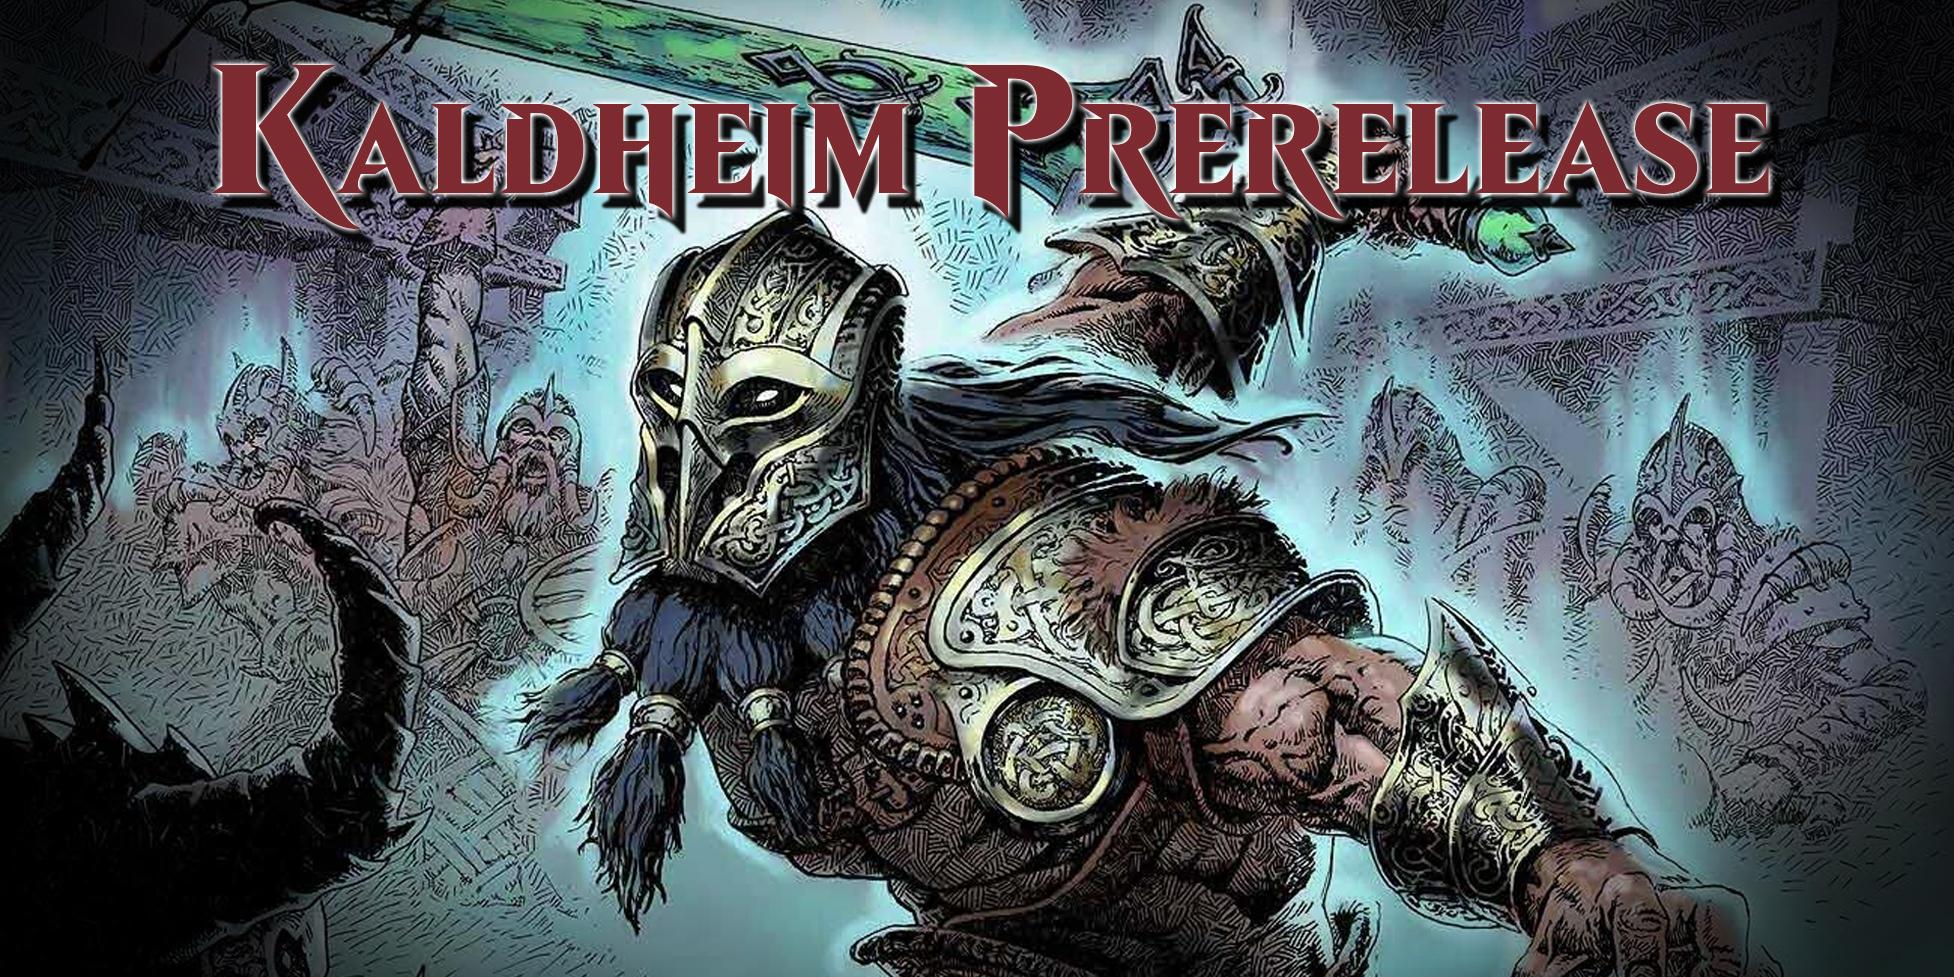 Kaldheim Prerelease